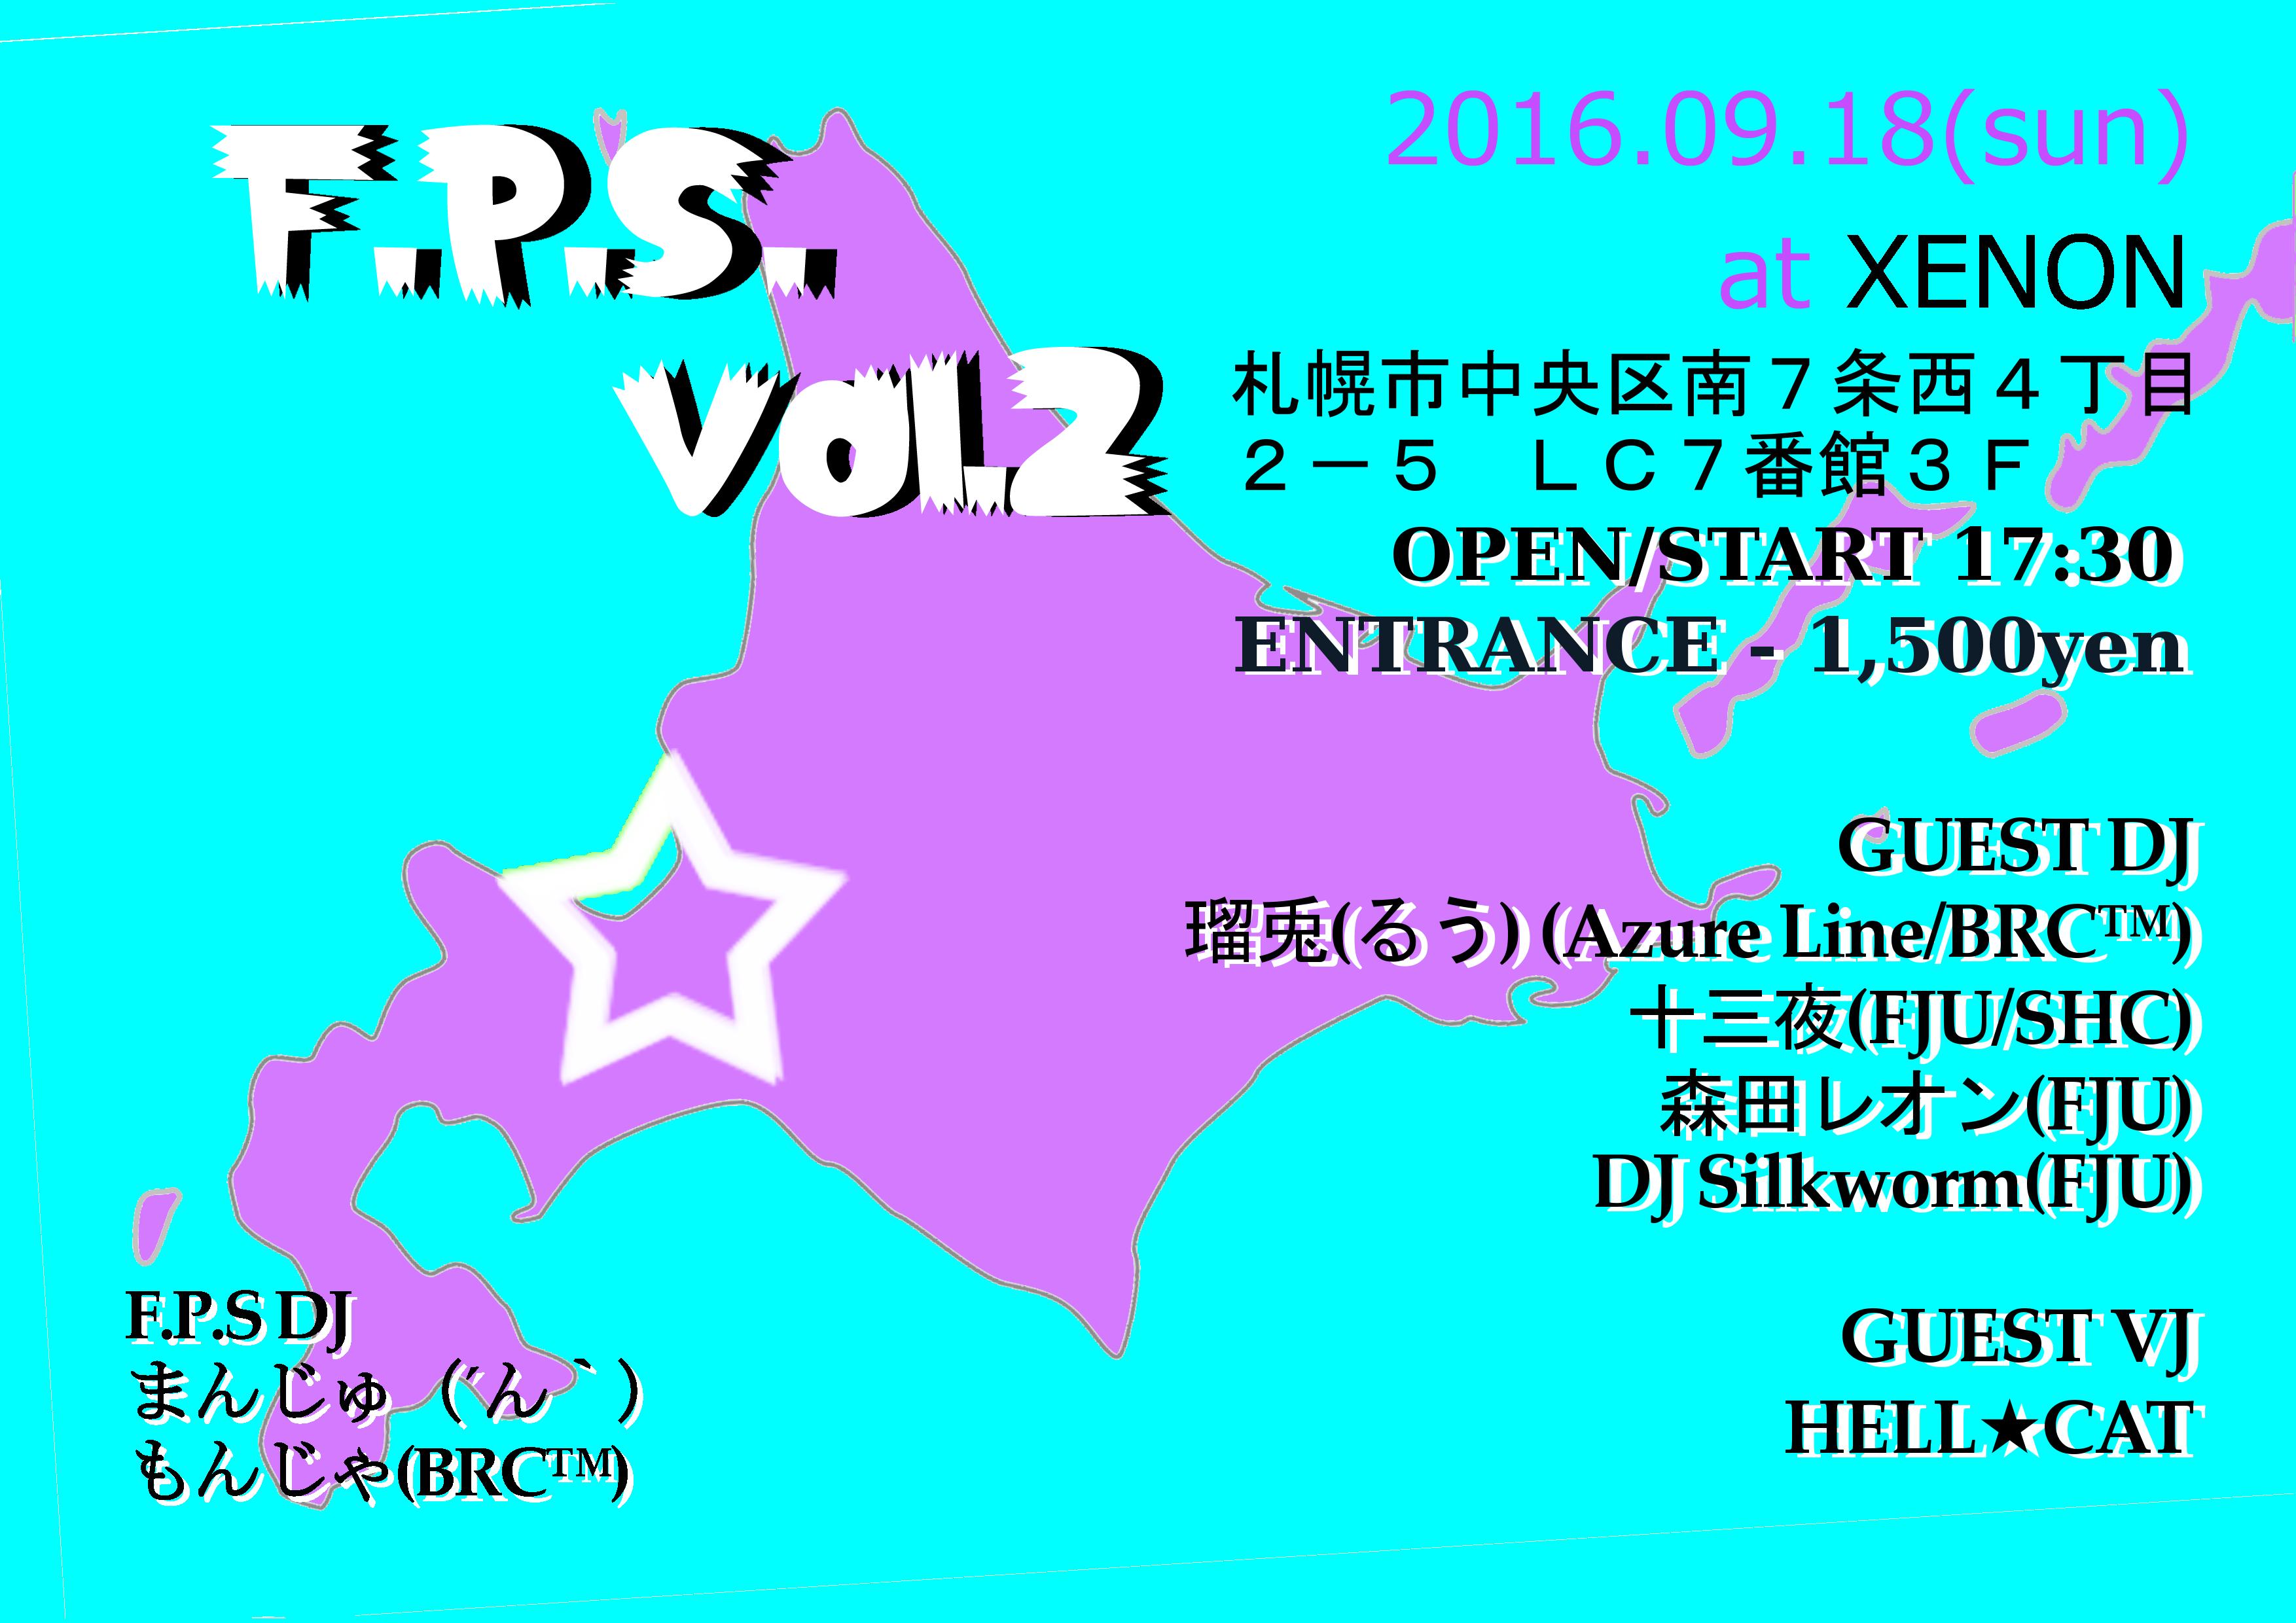 FPSvol2-kai.png